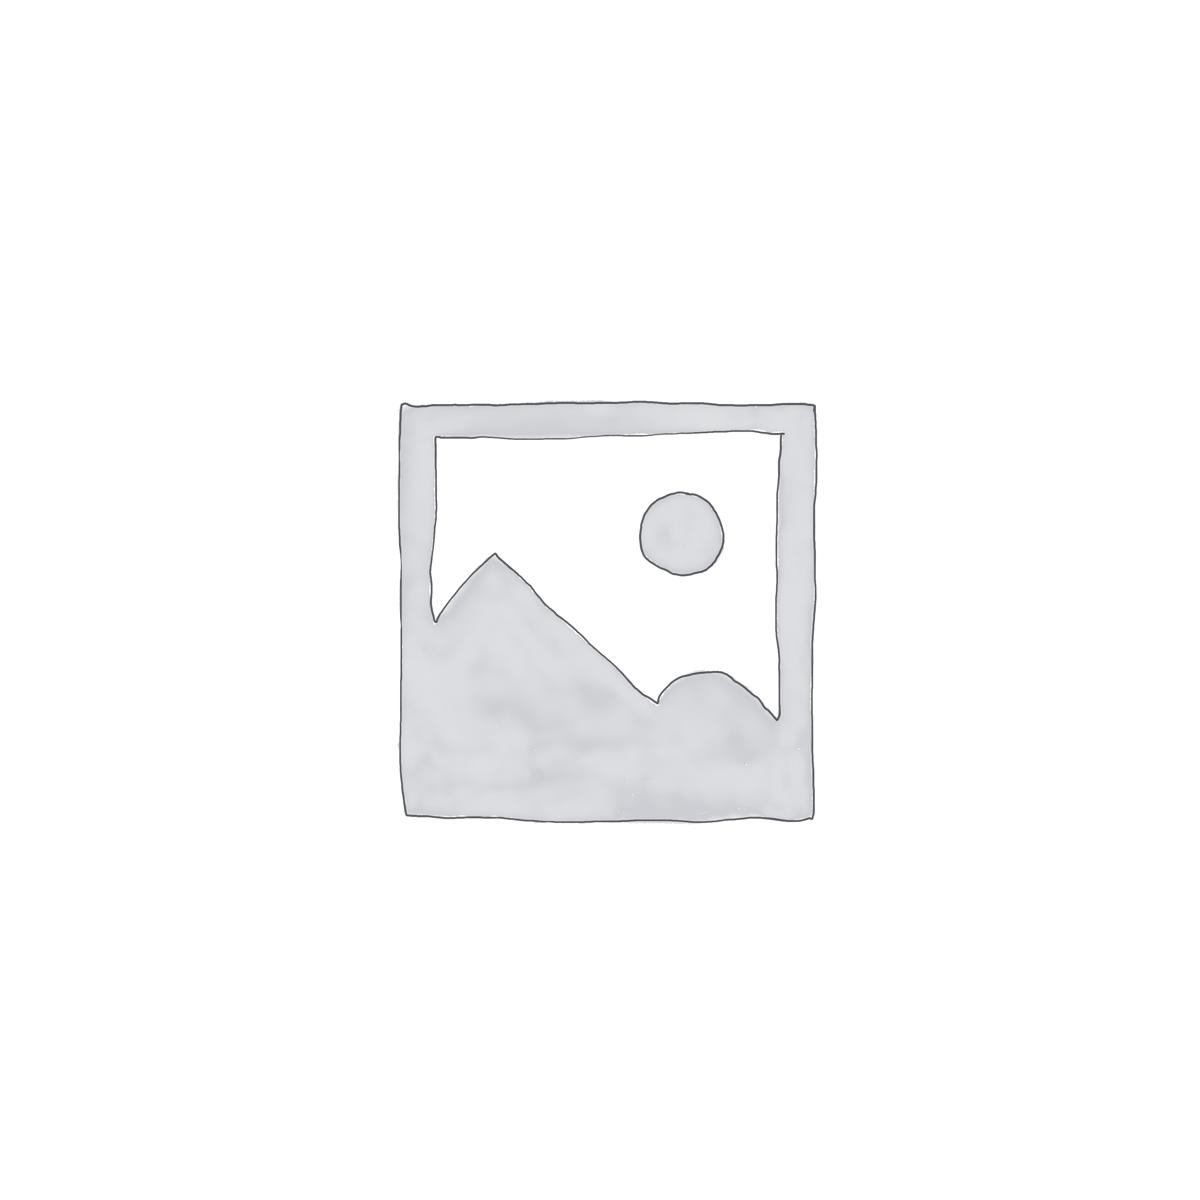 گوشی موبایل اپل مدل iPhone 11 Pro A2217 دو سیم کارت ظرفیت ۶۴ گیگابایت